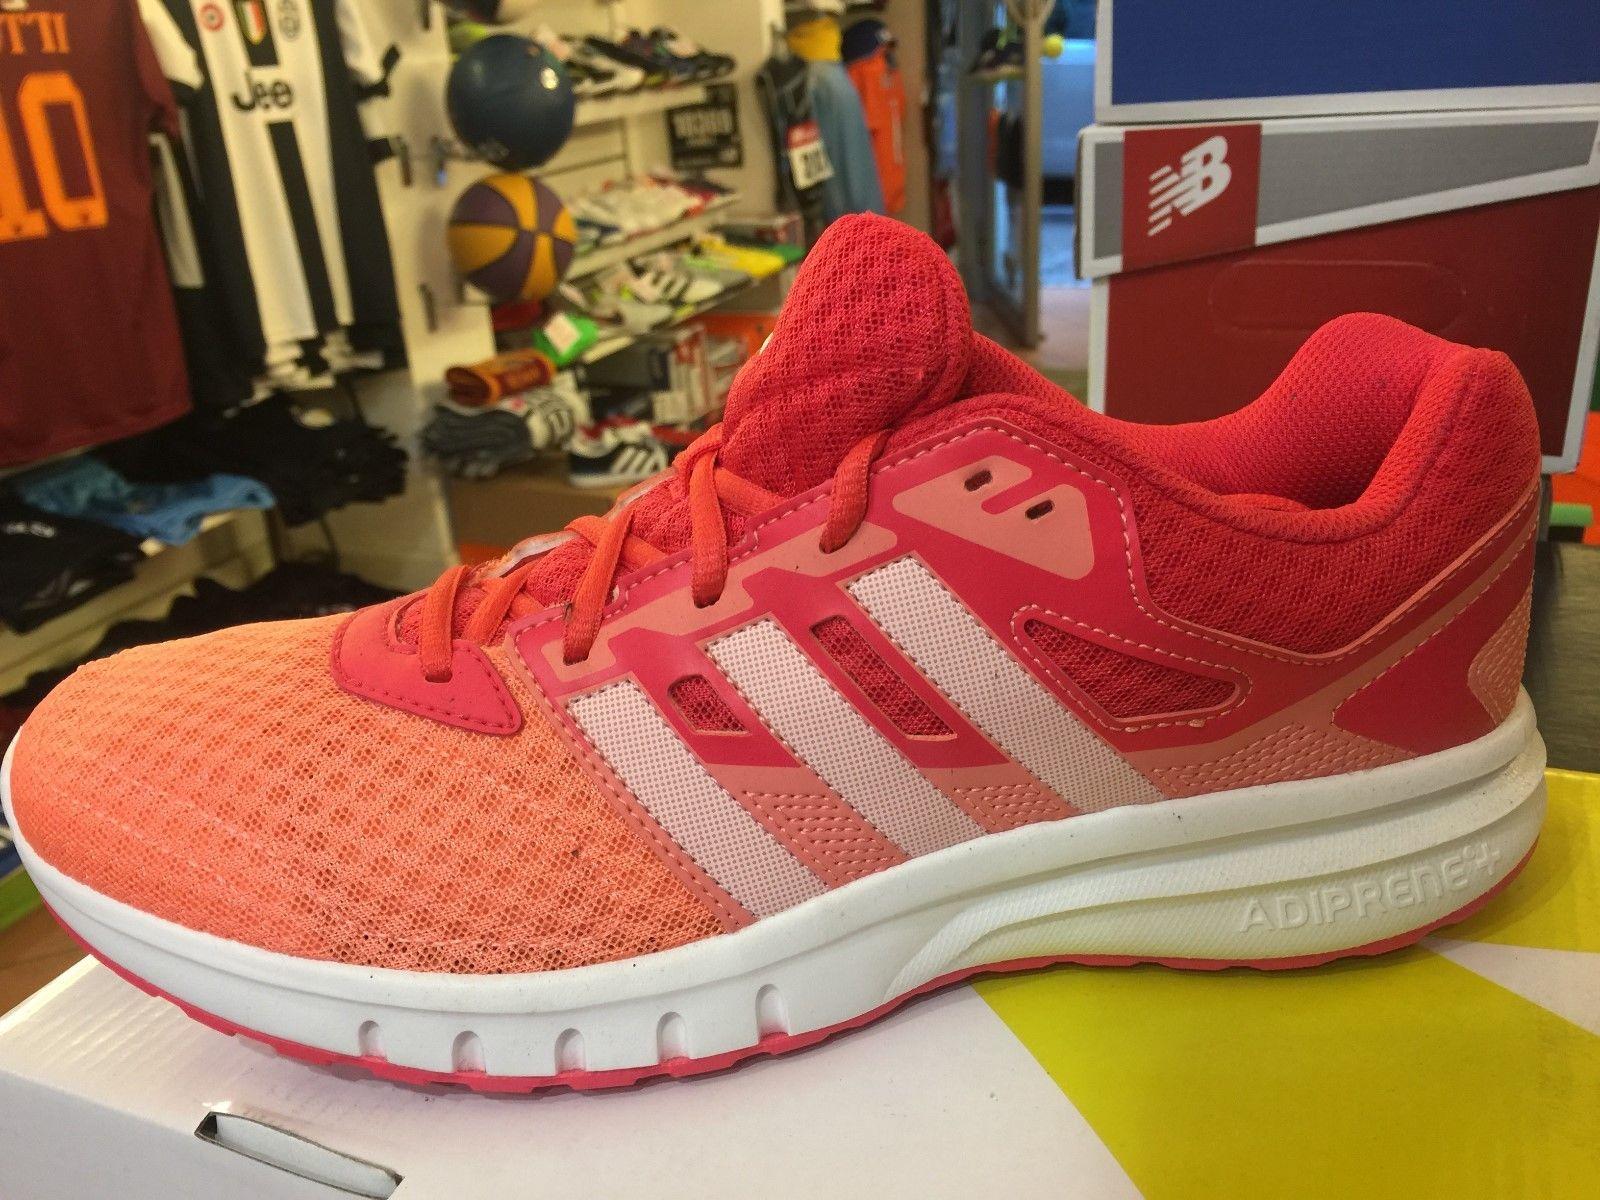 adidas scarpe donna corsa